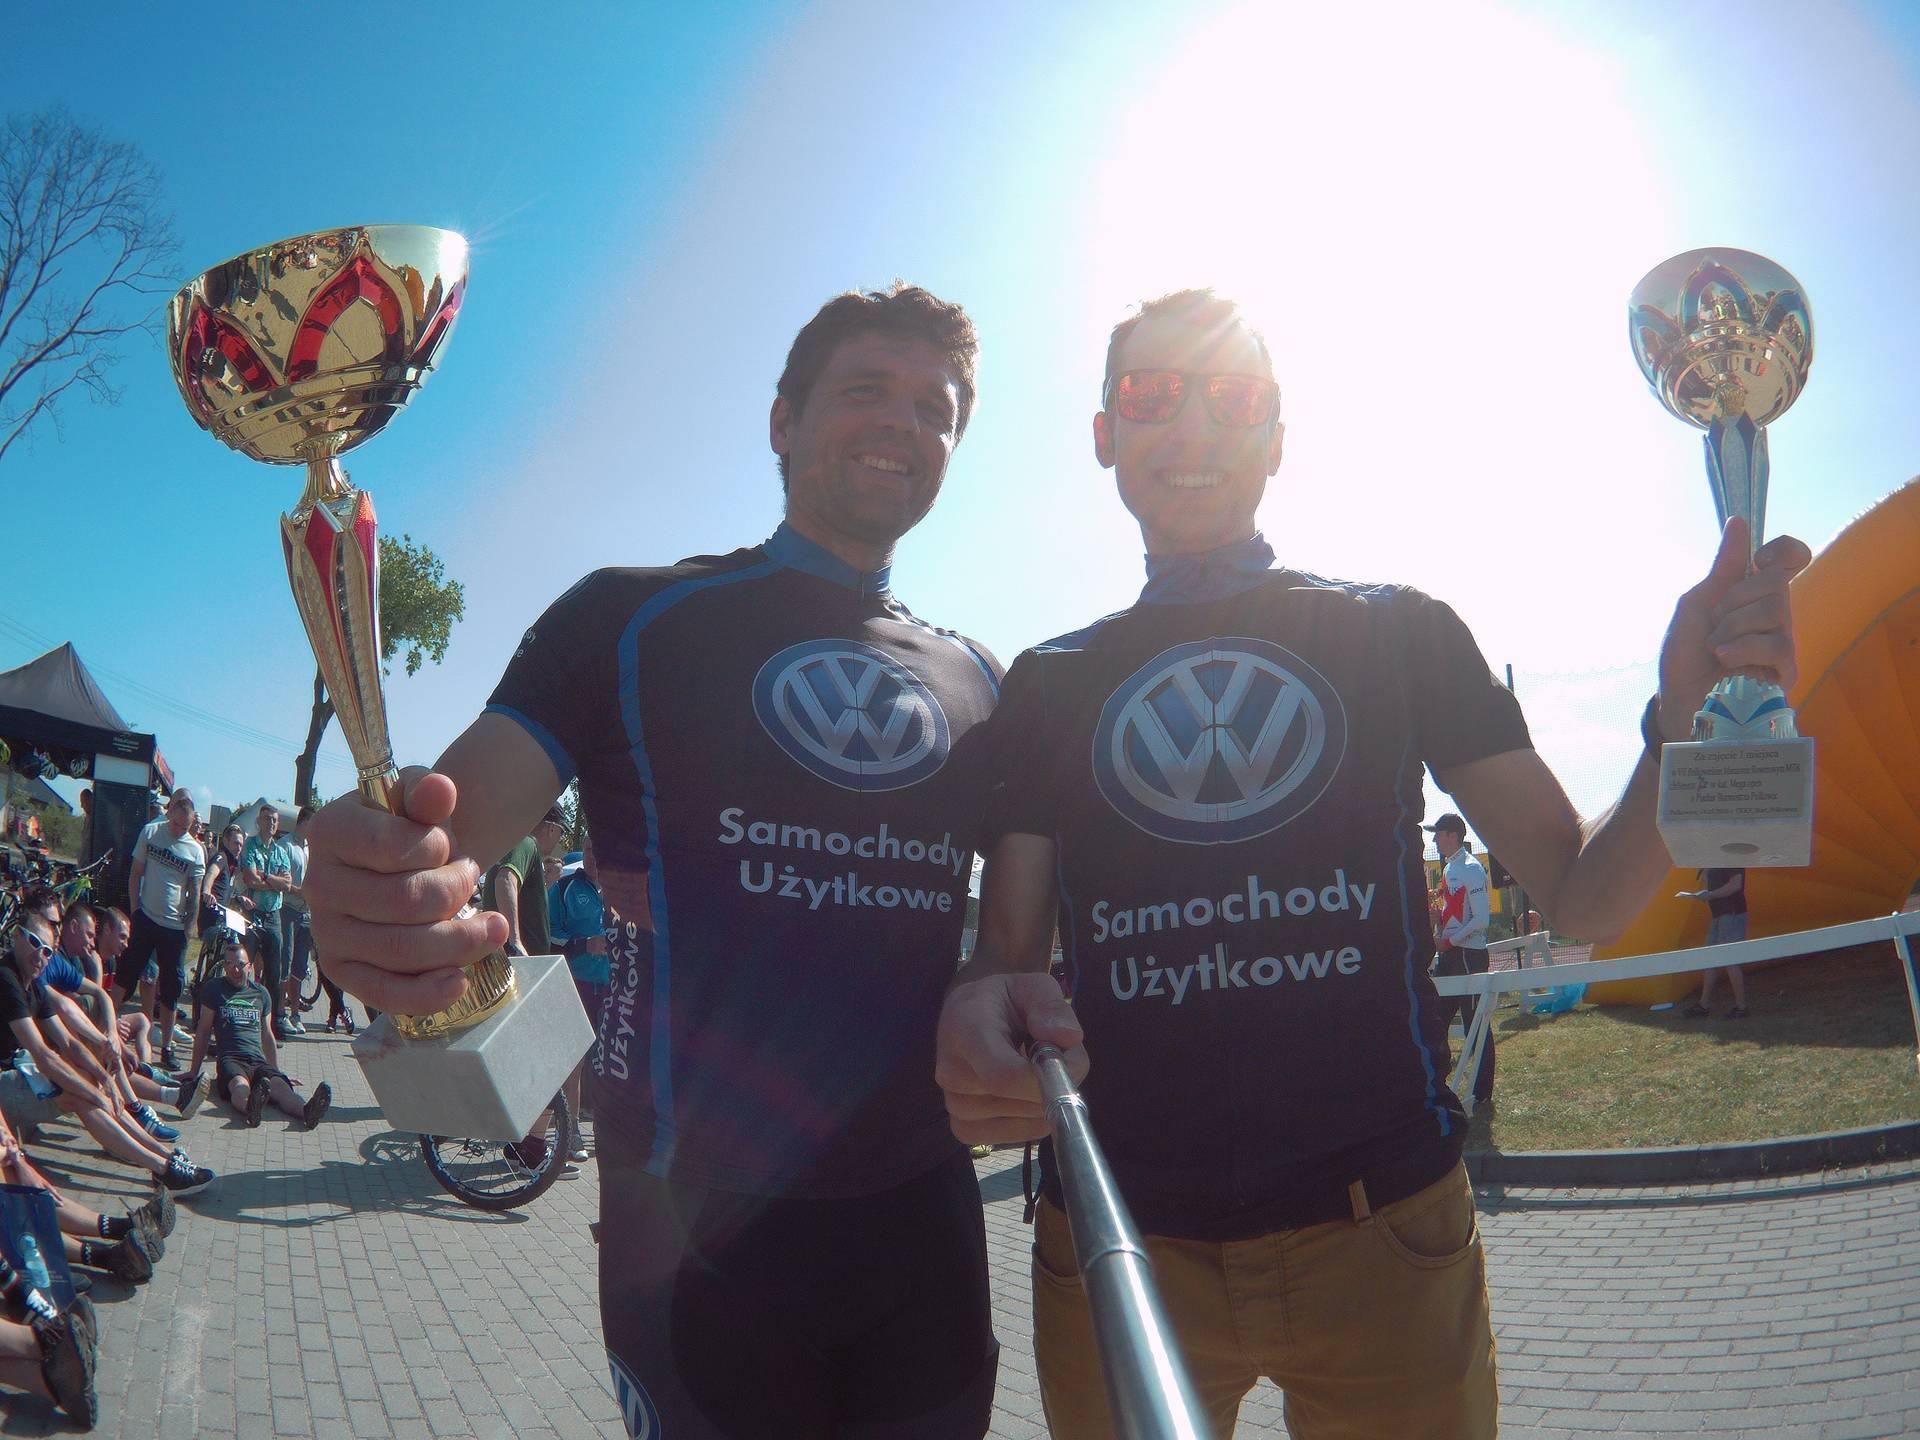 Michał Ficek (Volkswagen Samochody Użytkowe MTB) – VII Polkowicki Maraton MTB, Polkowice